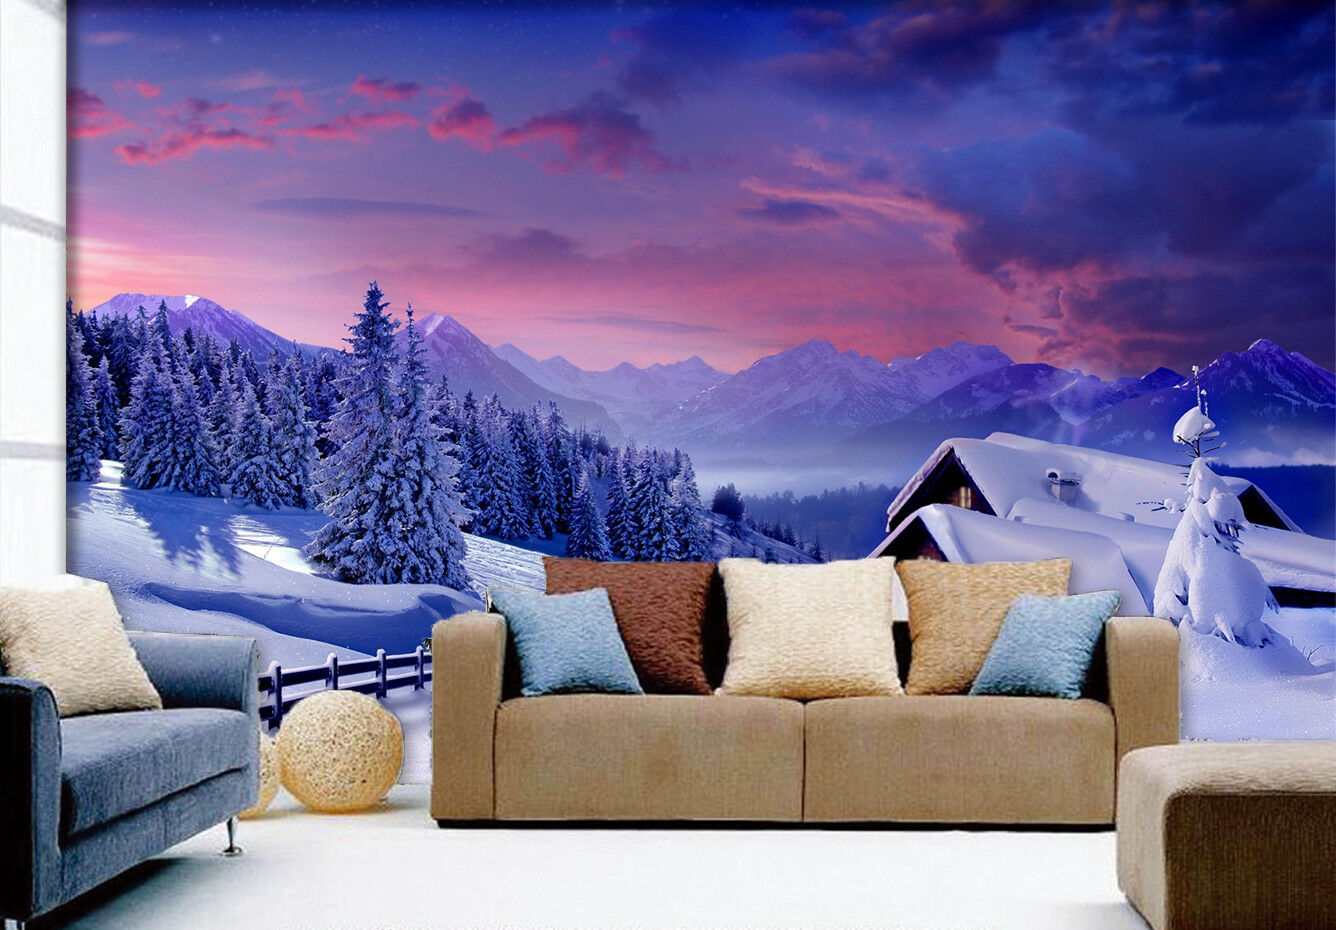 3D Wald Haus Haus Haus Schnee 74 Tapete Wandgemälde Tapete Tapeten Bild Familie DE   Am wirtschaftlichsten    Am wirtschaftlichsten     02bf9e